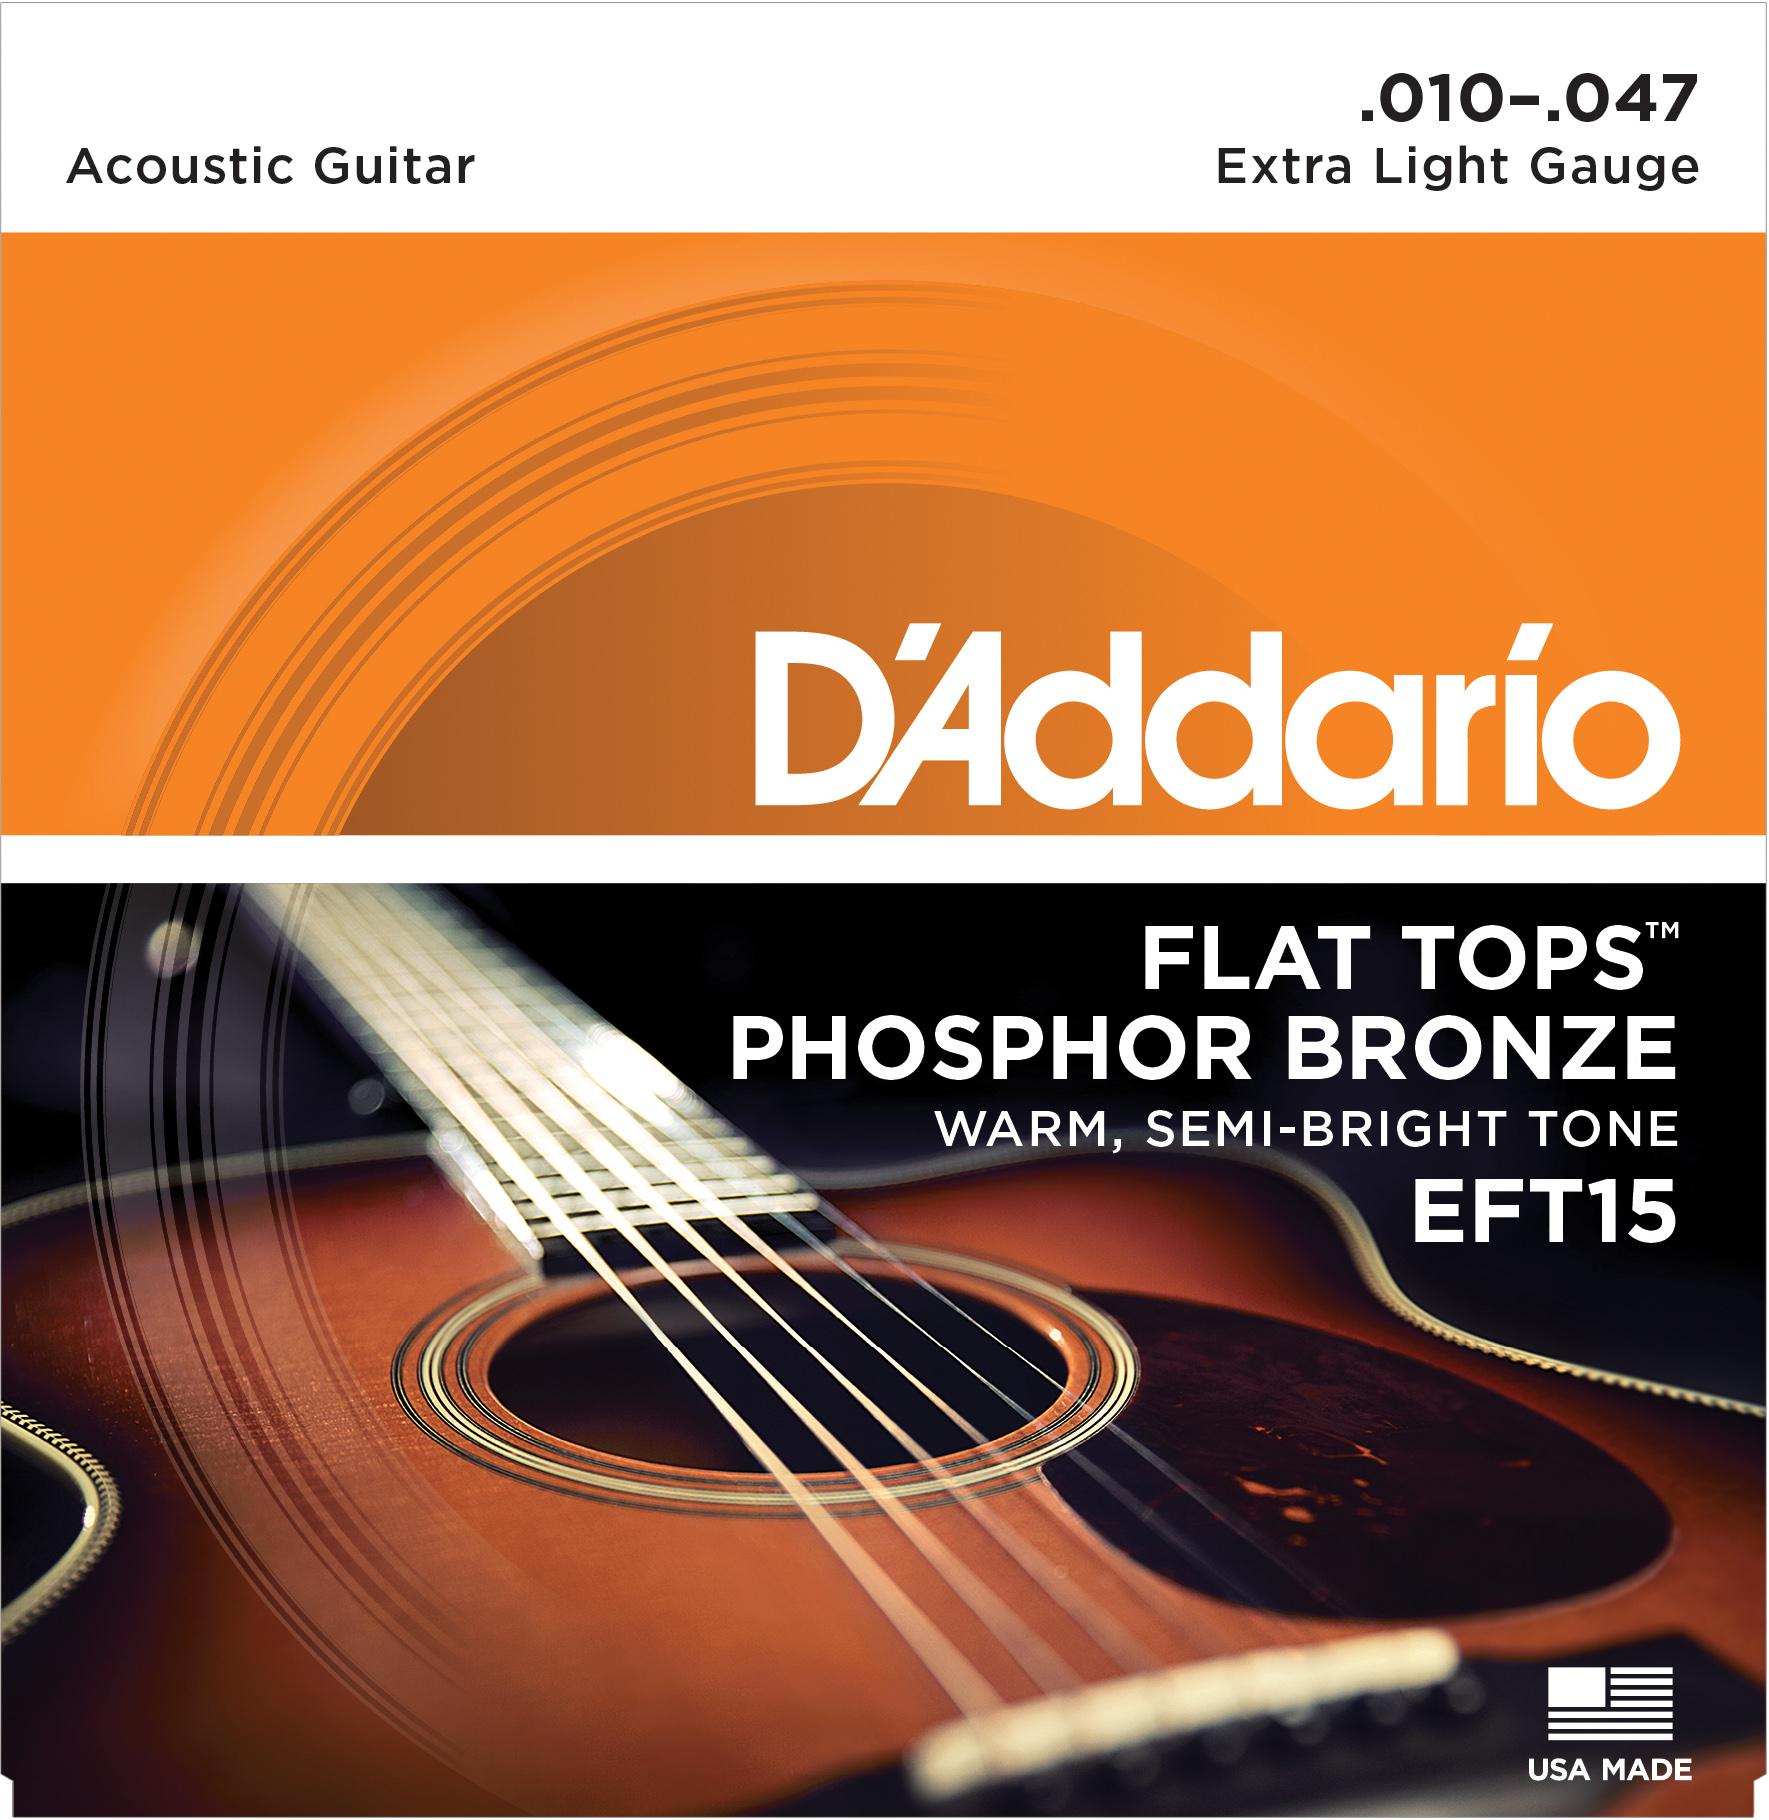 D'Addario EFT15 Flat Tops Phosphor Bronze Acoustic Guitar Strings, Extra Light, ...